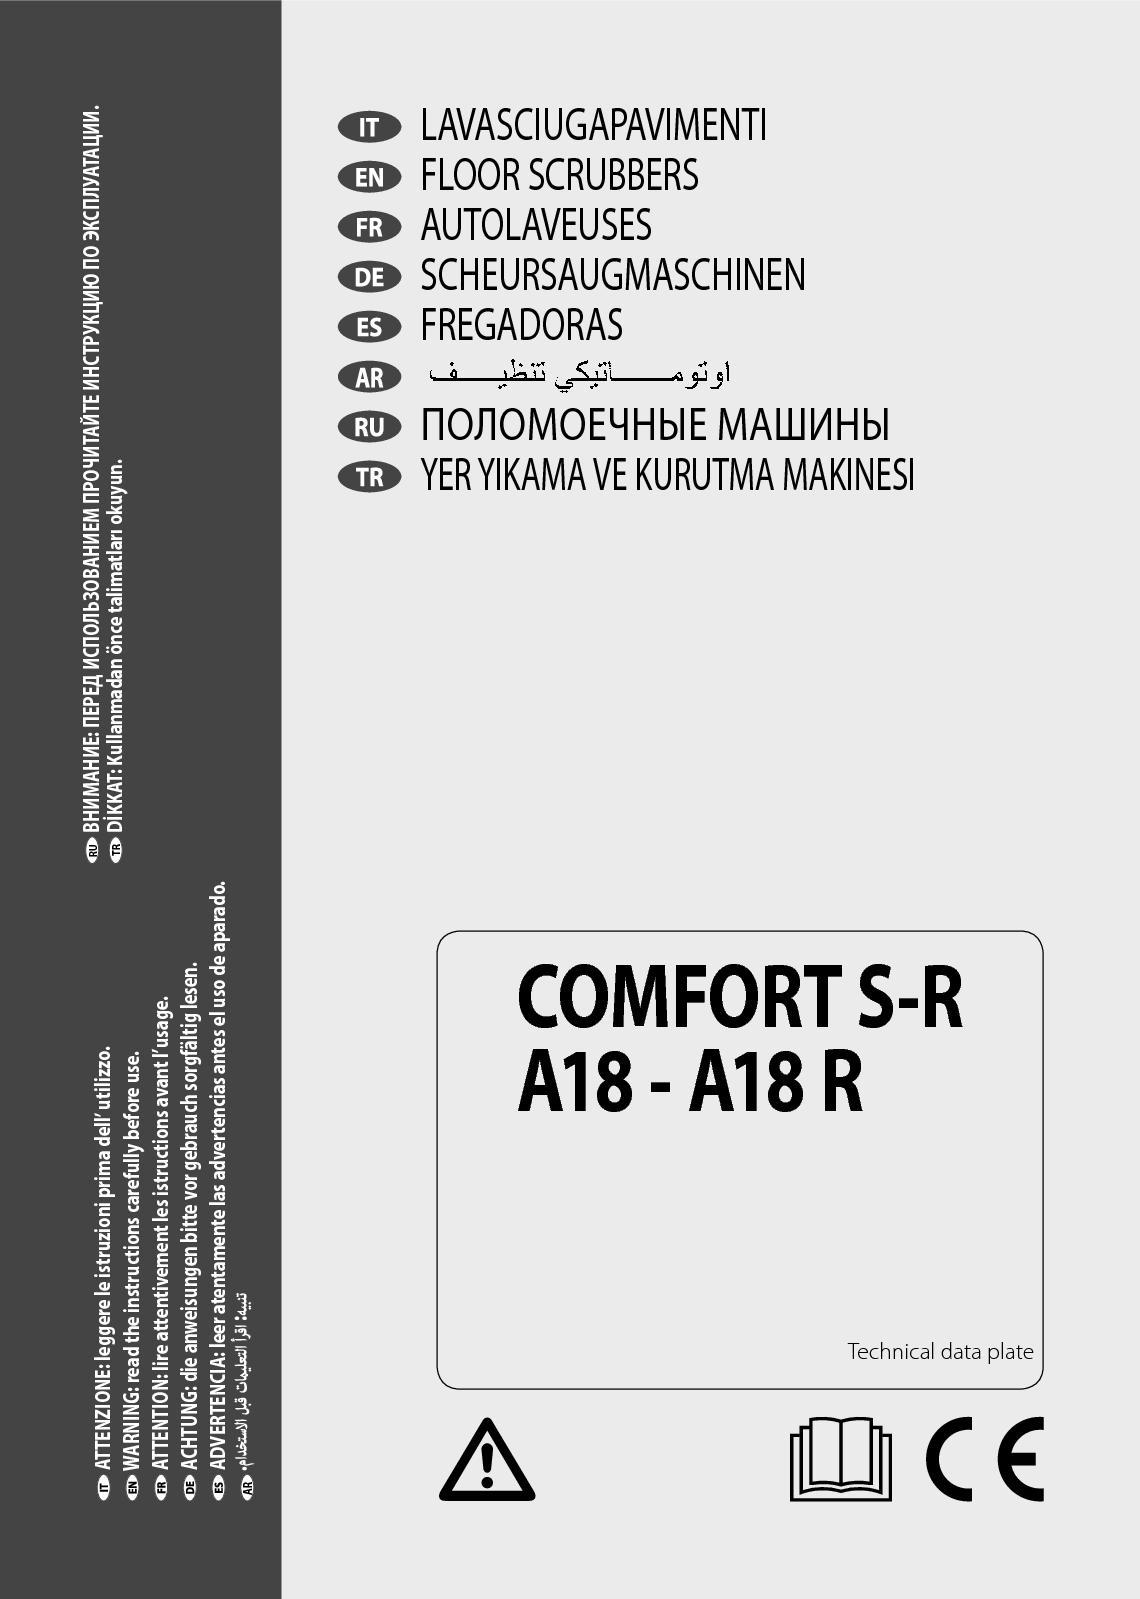 Calamo Manuale Comfort S Rpdf Holder Fuse Box 87 Dakika